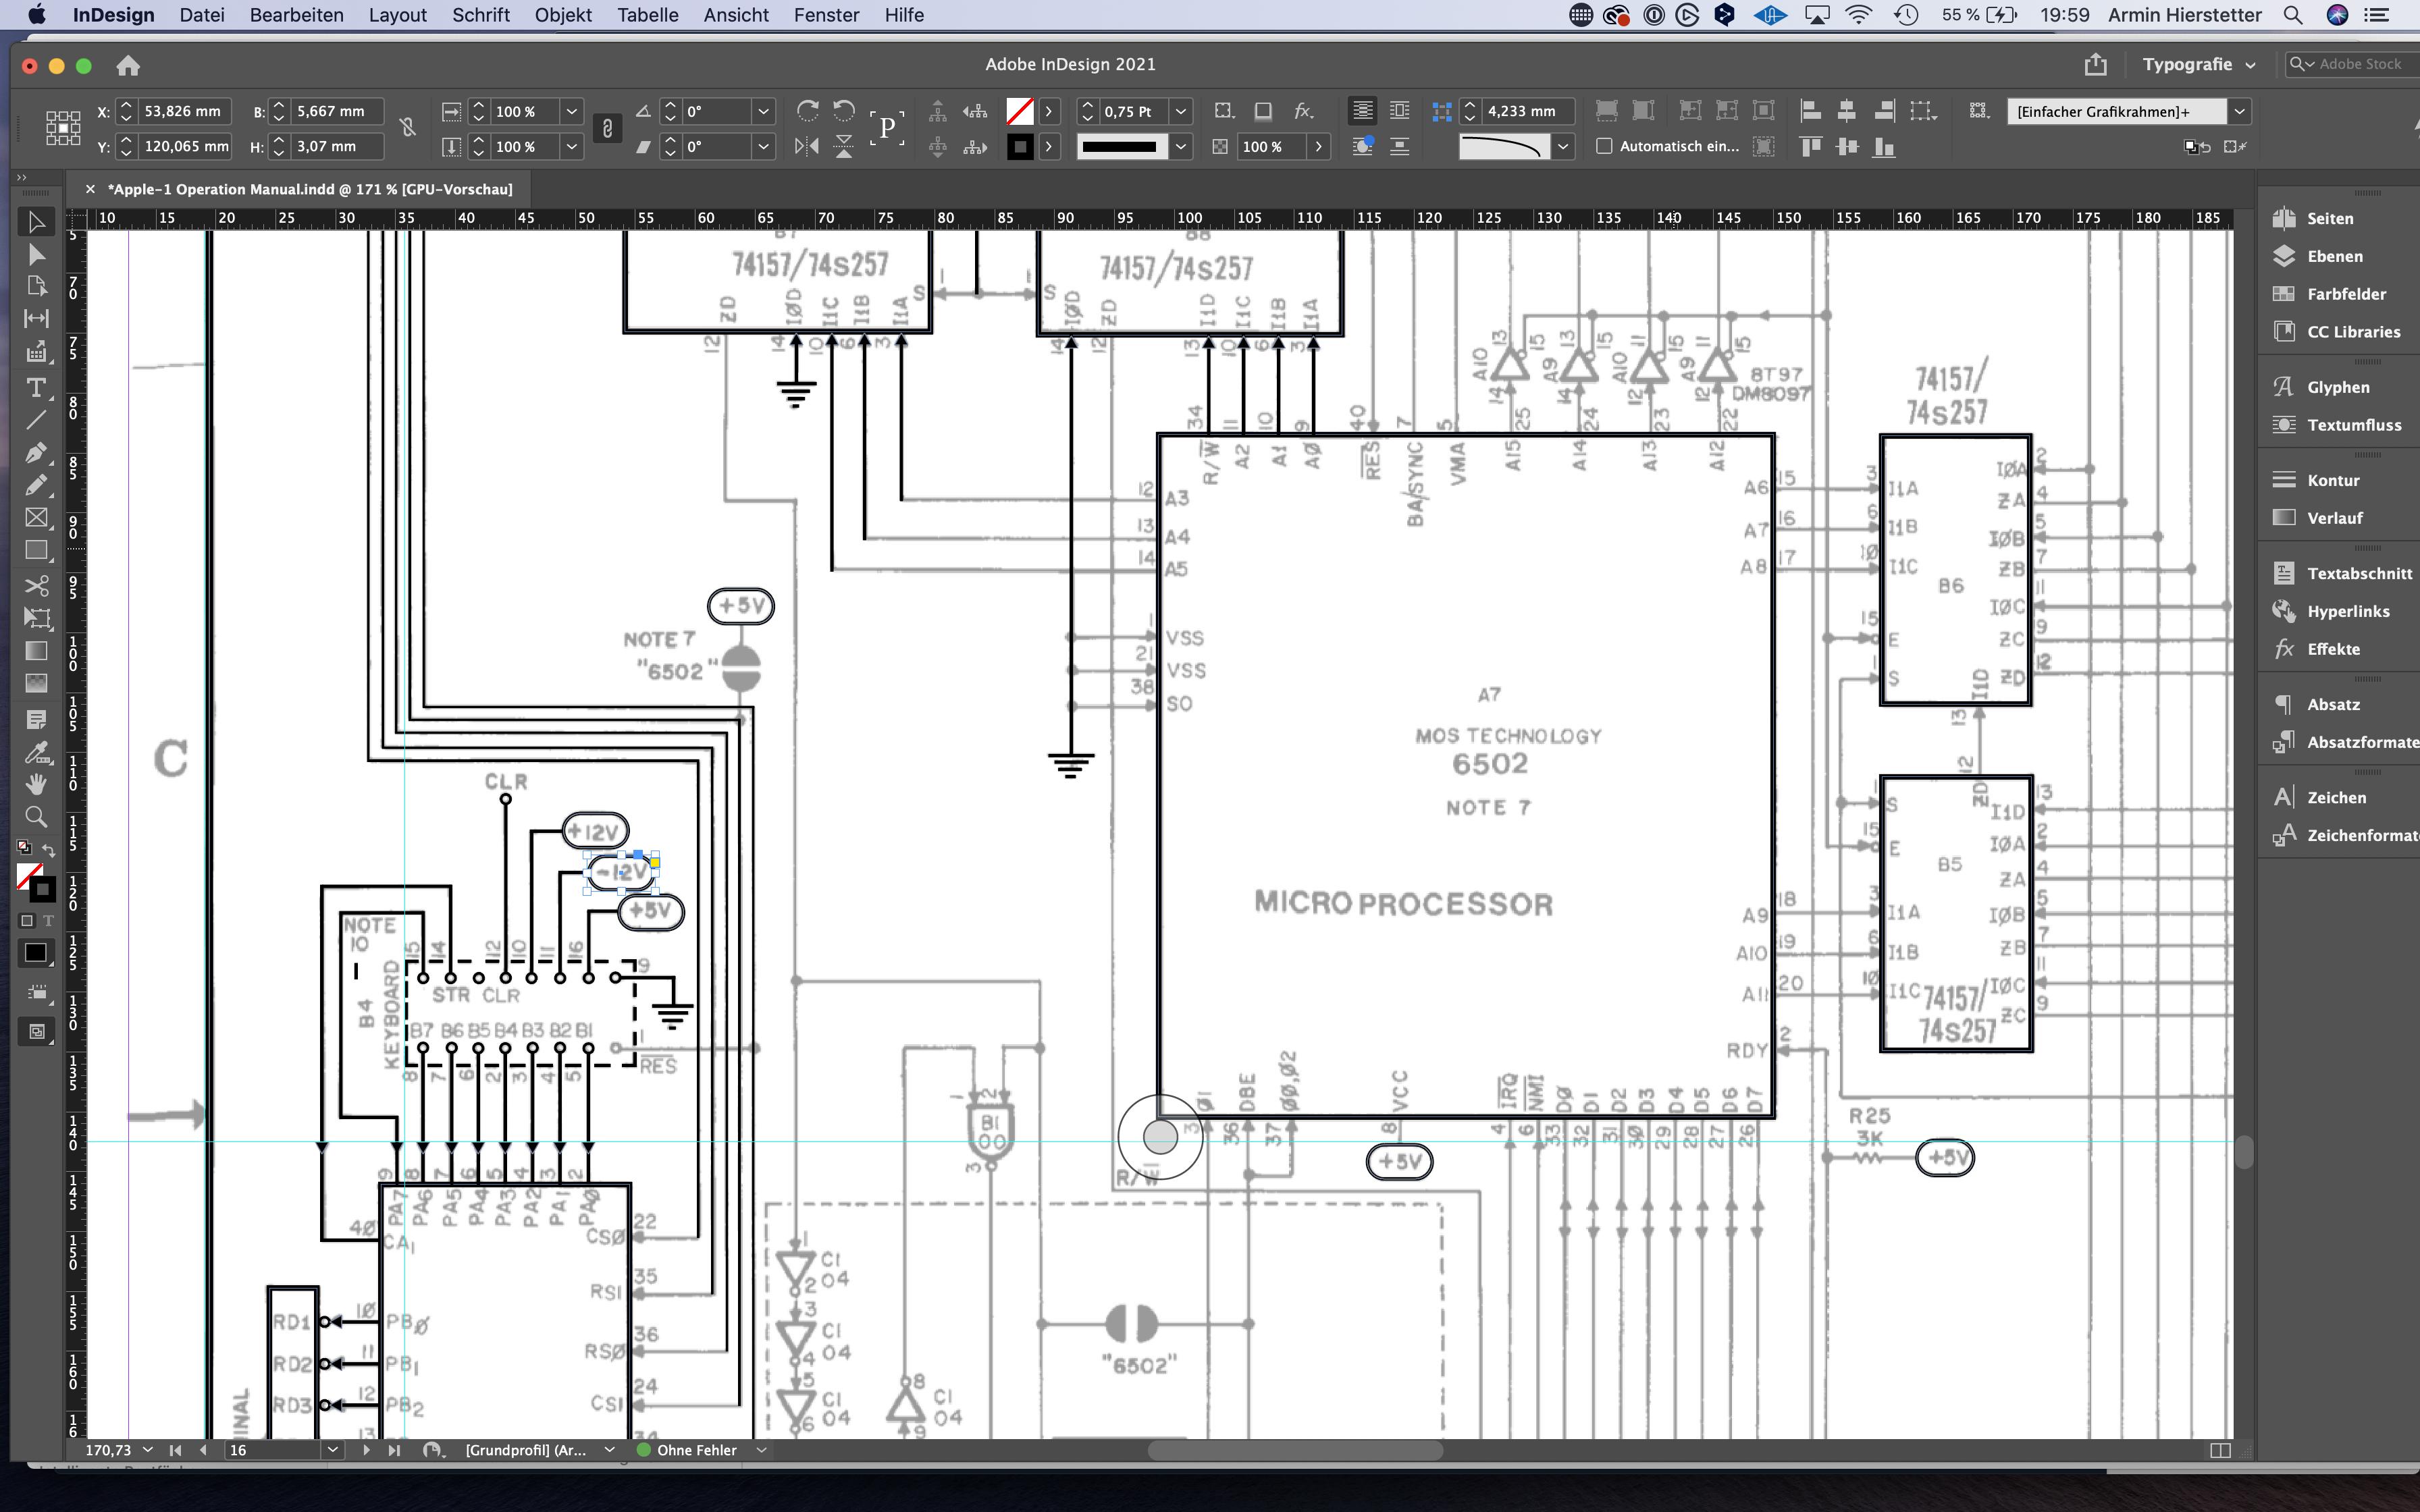 Rebuilding The Apple-1 Schematics With InDesign